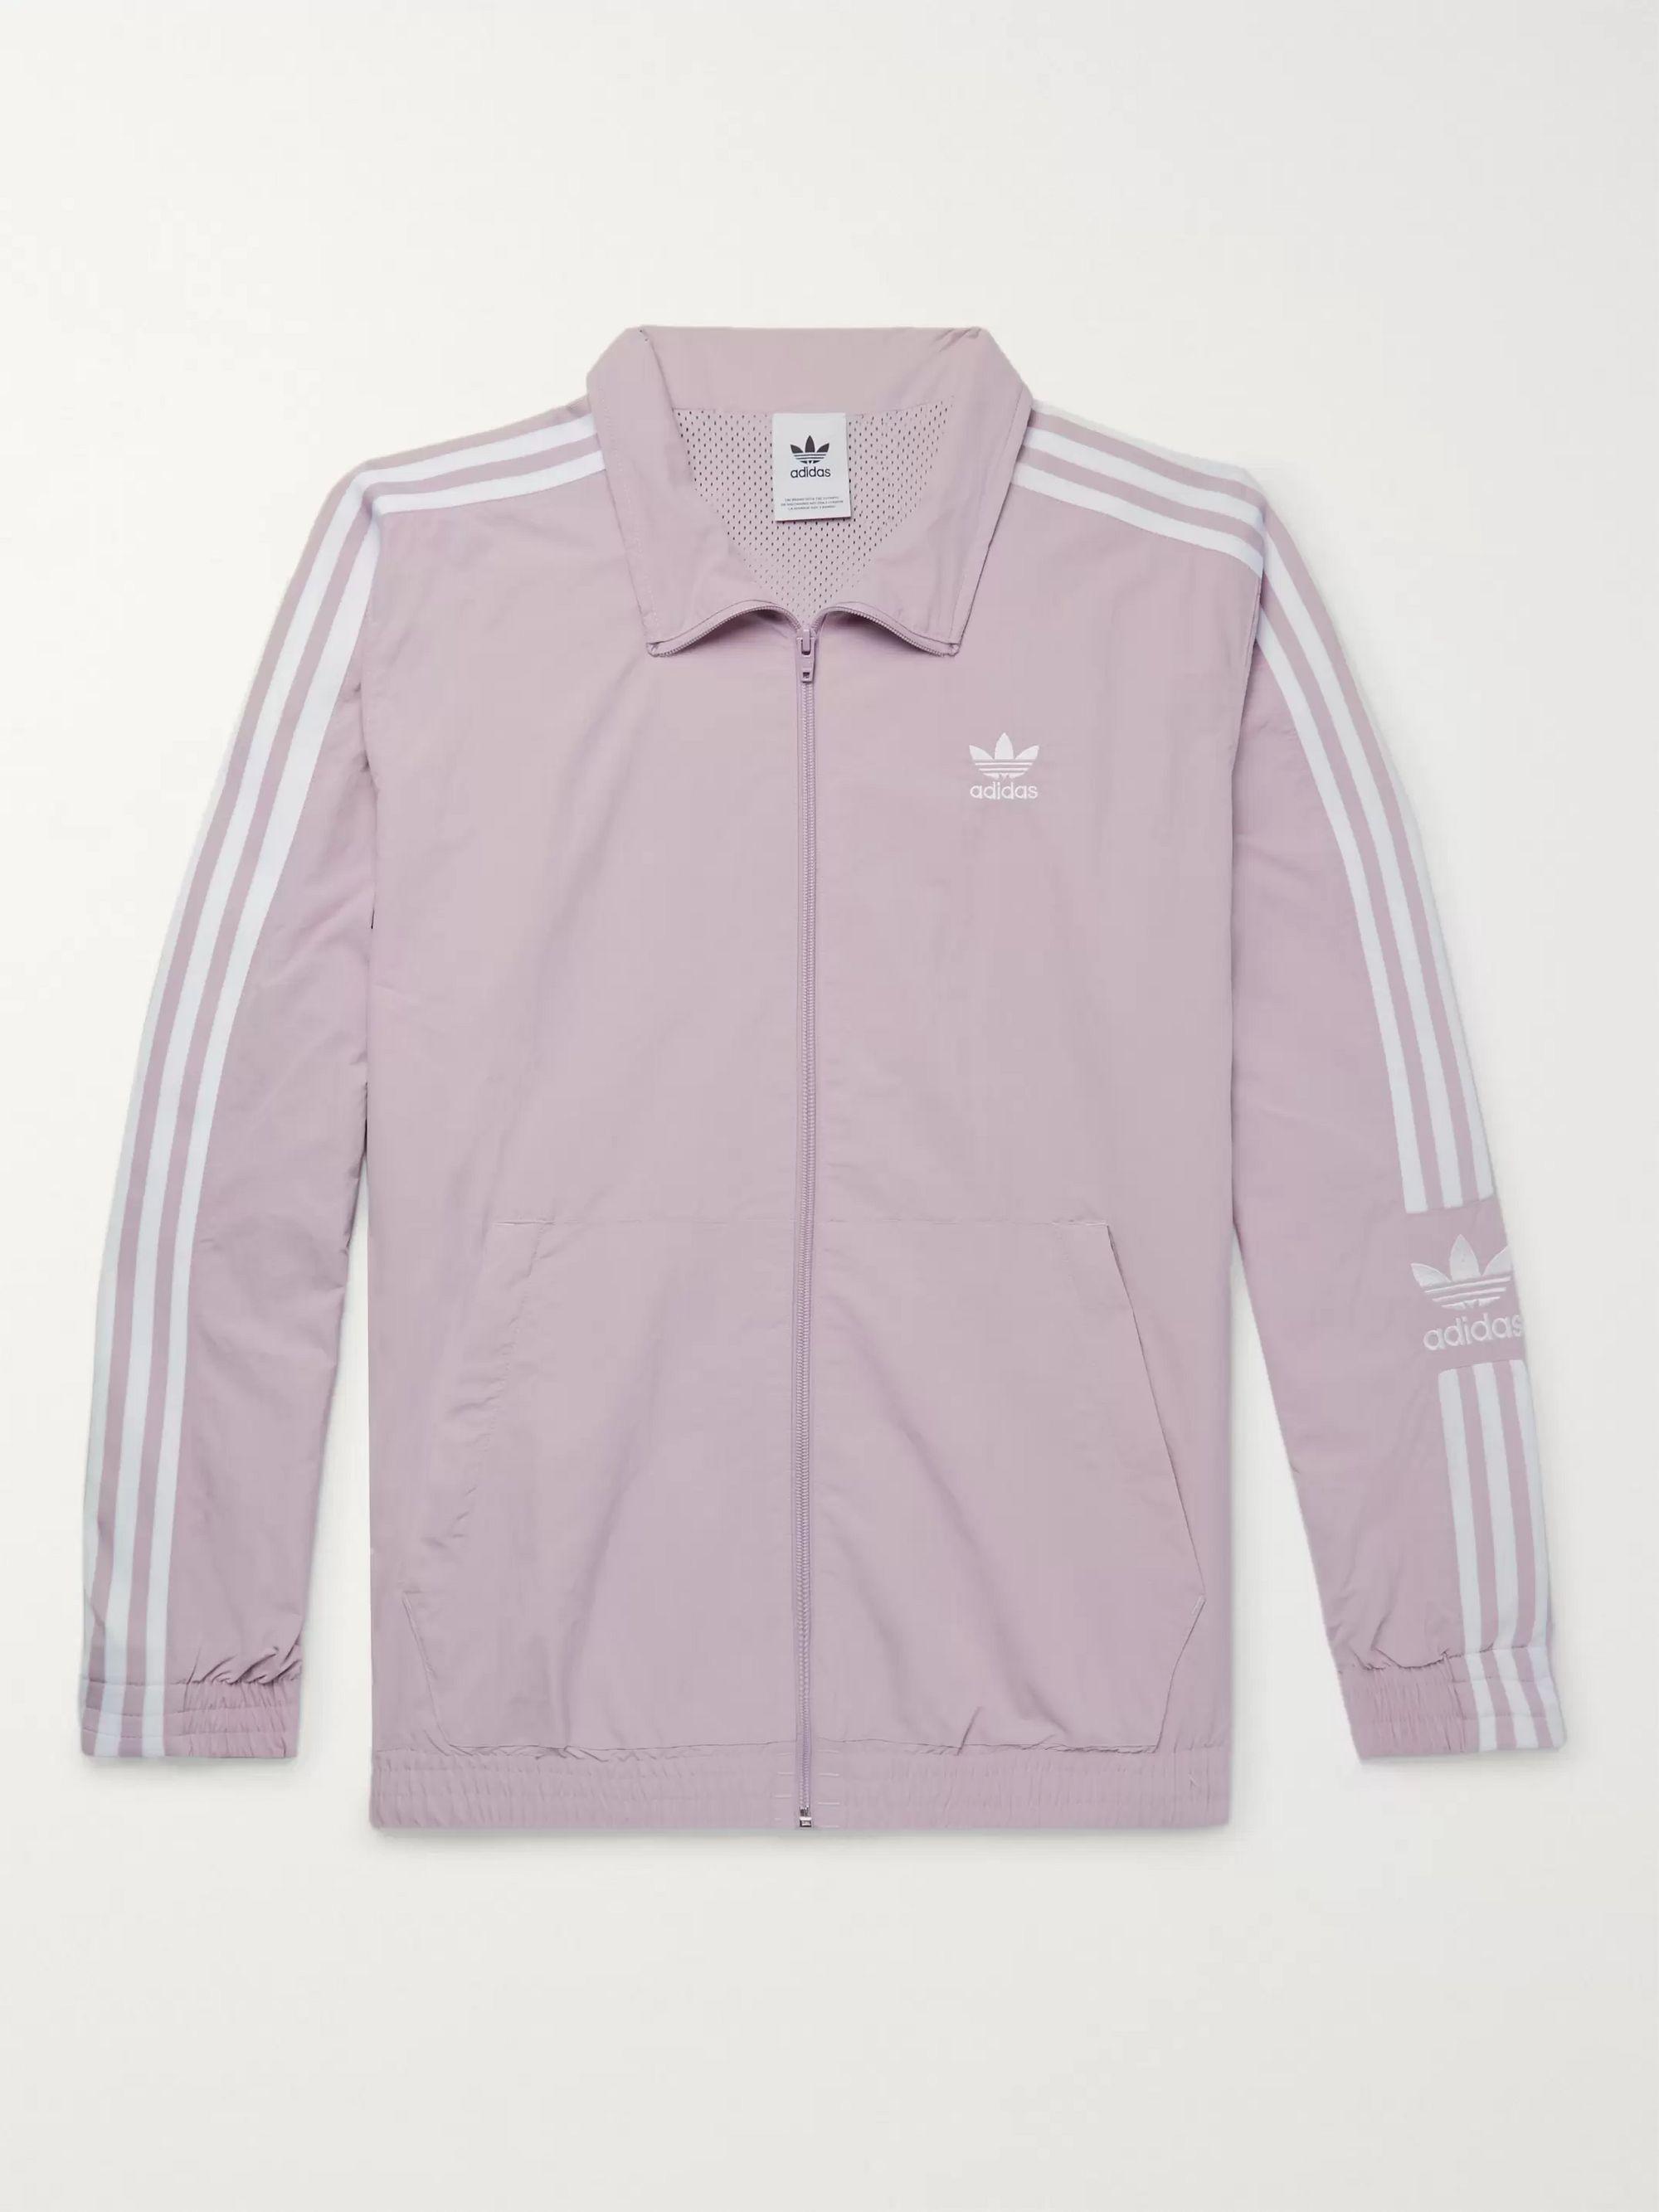 Adidas Originals Track Jacket Beige Size Depop